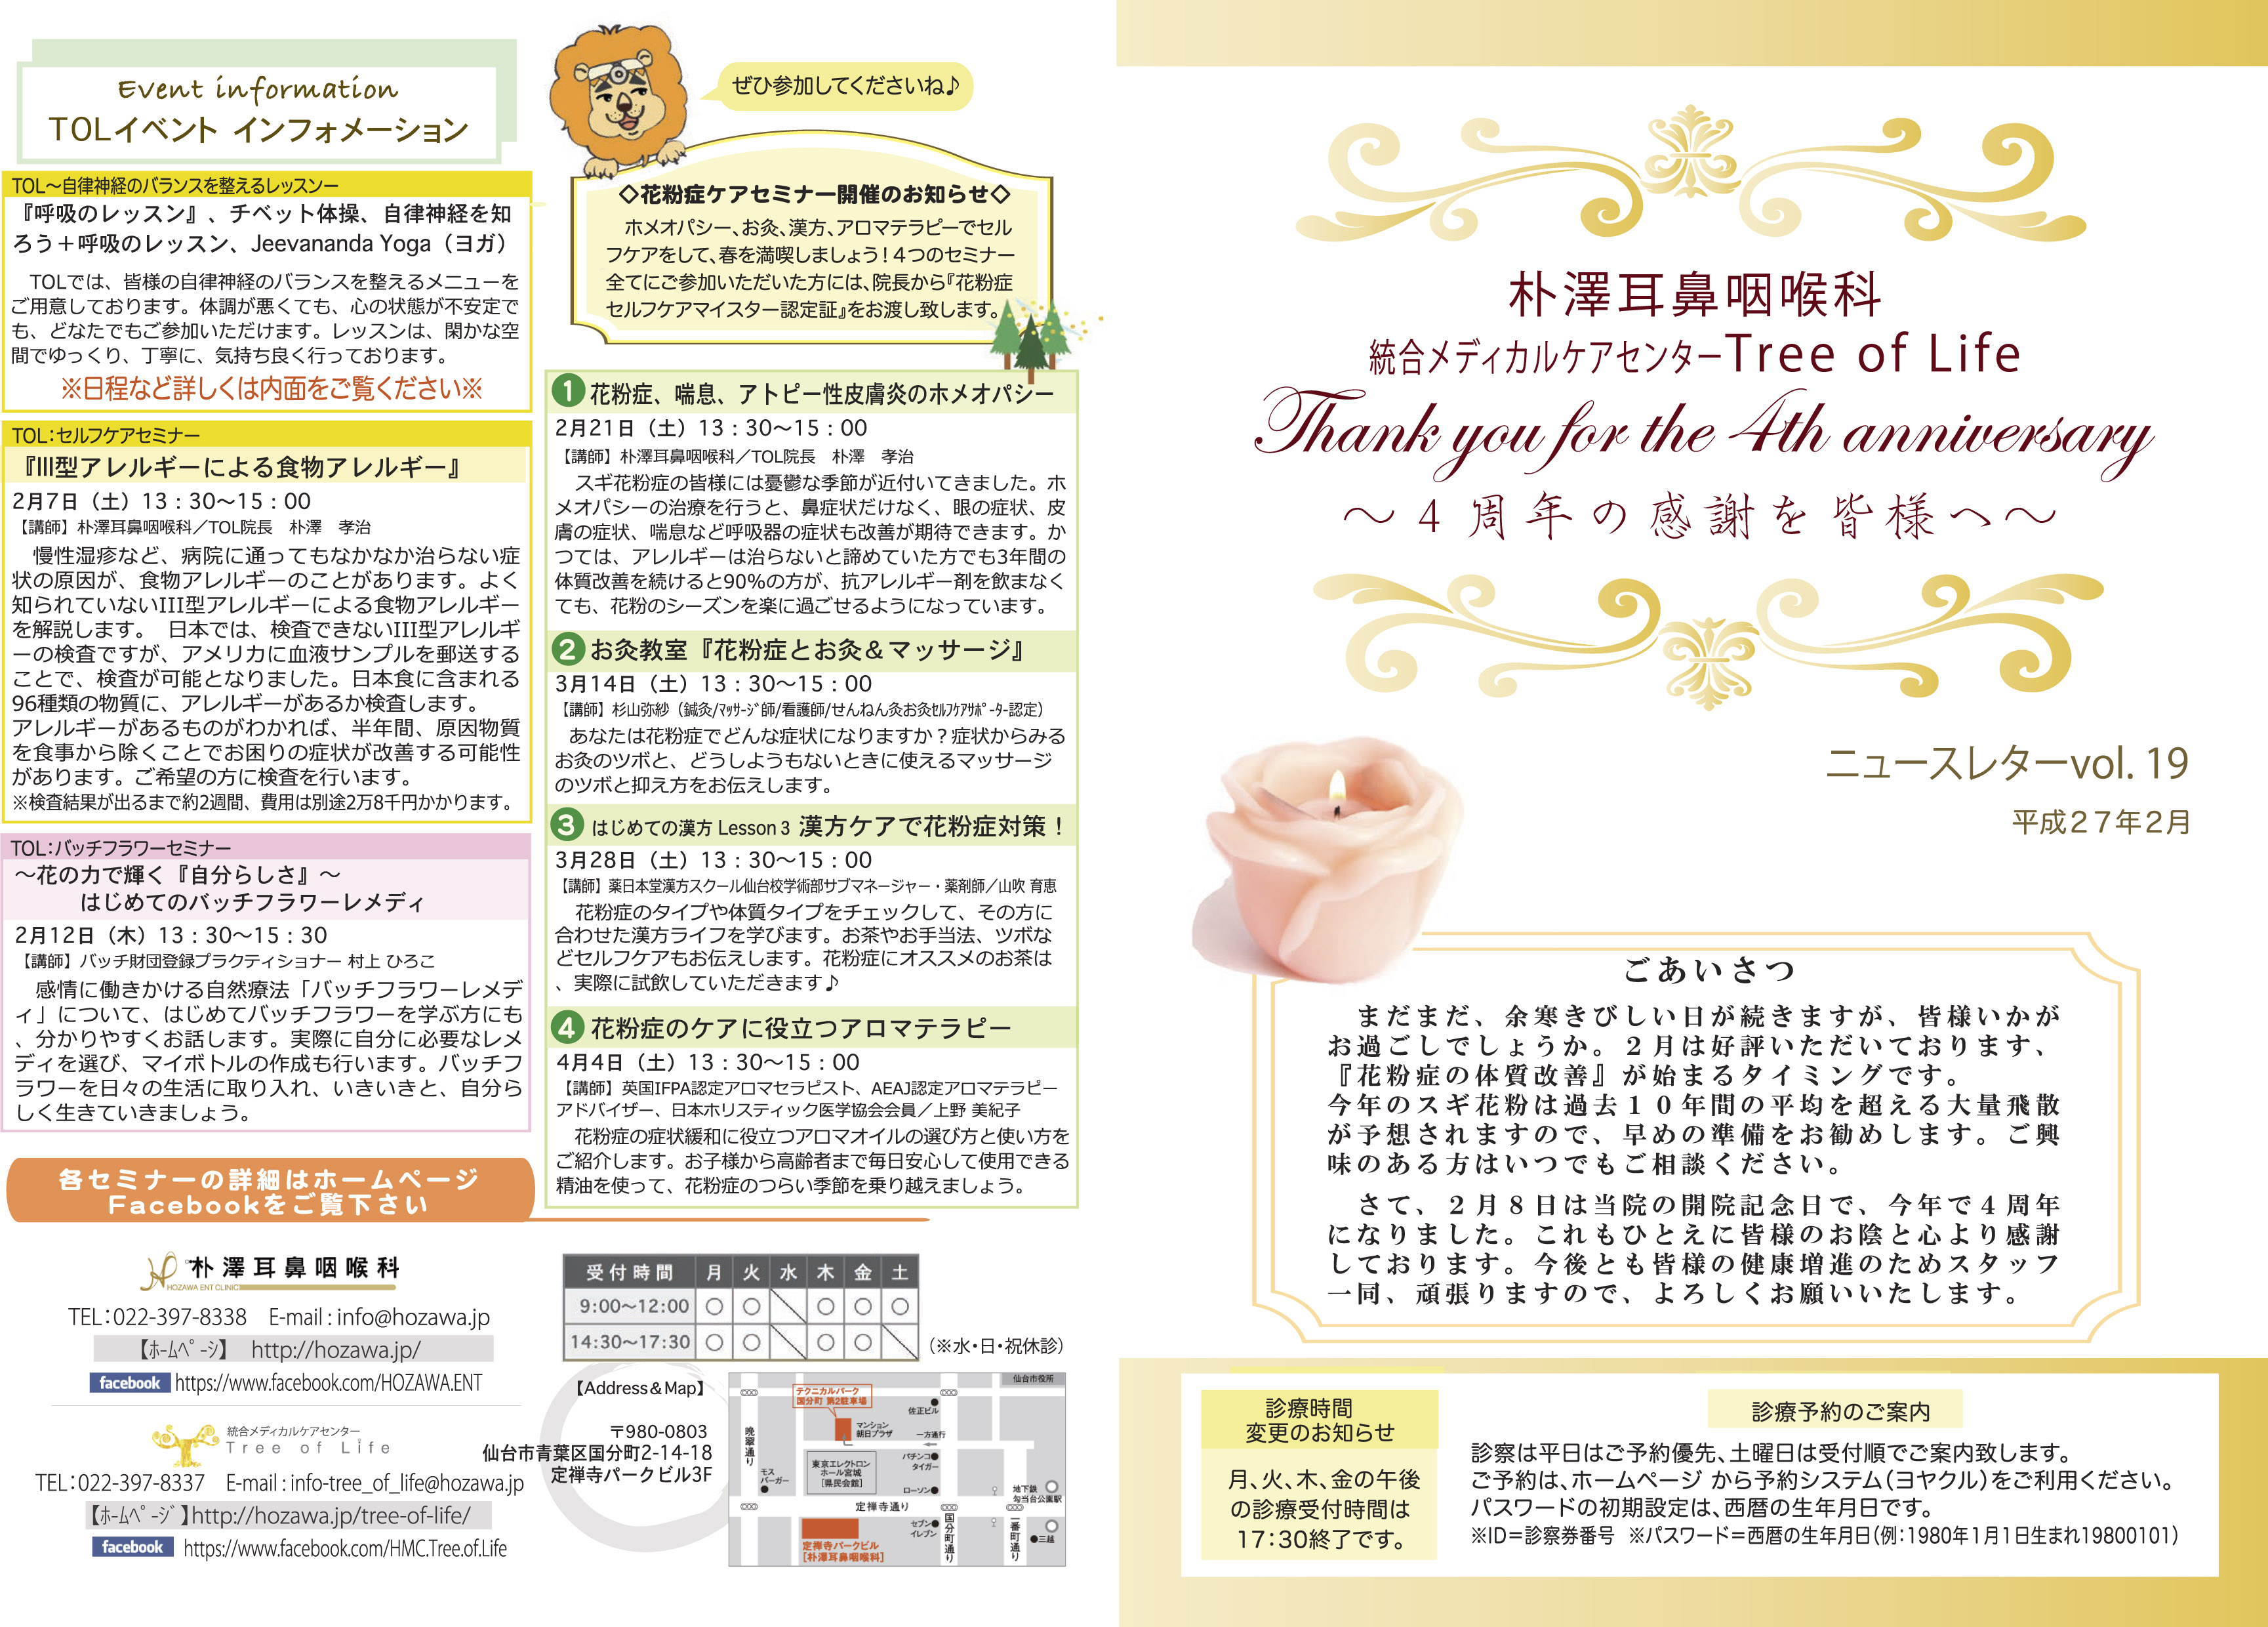 http://hozawa.jp/news/news_img/1501262513_01L-1.jpg